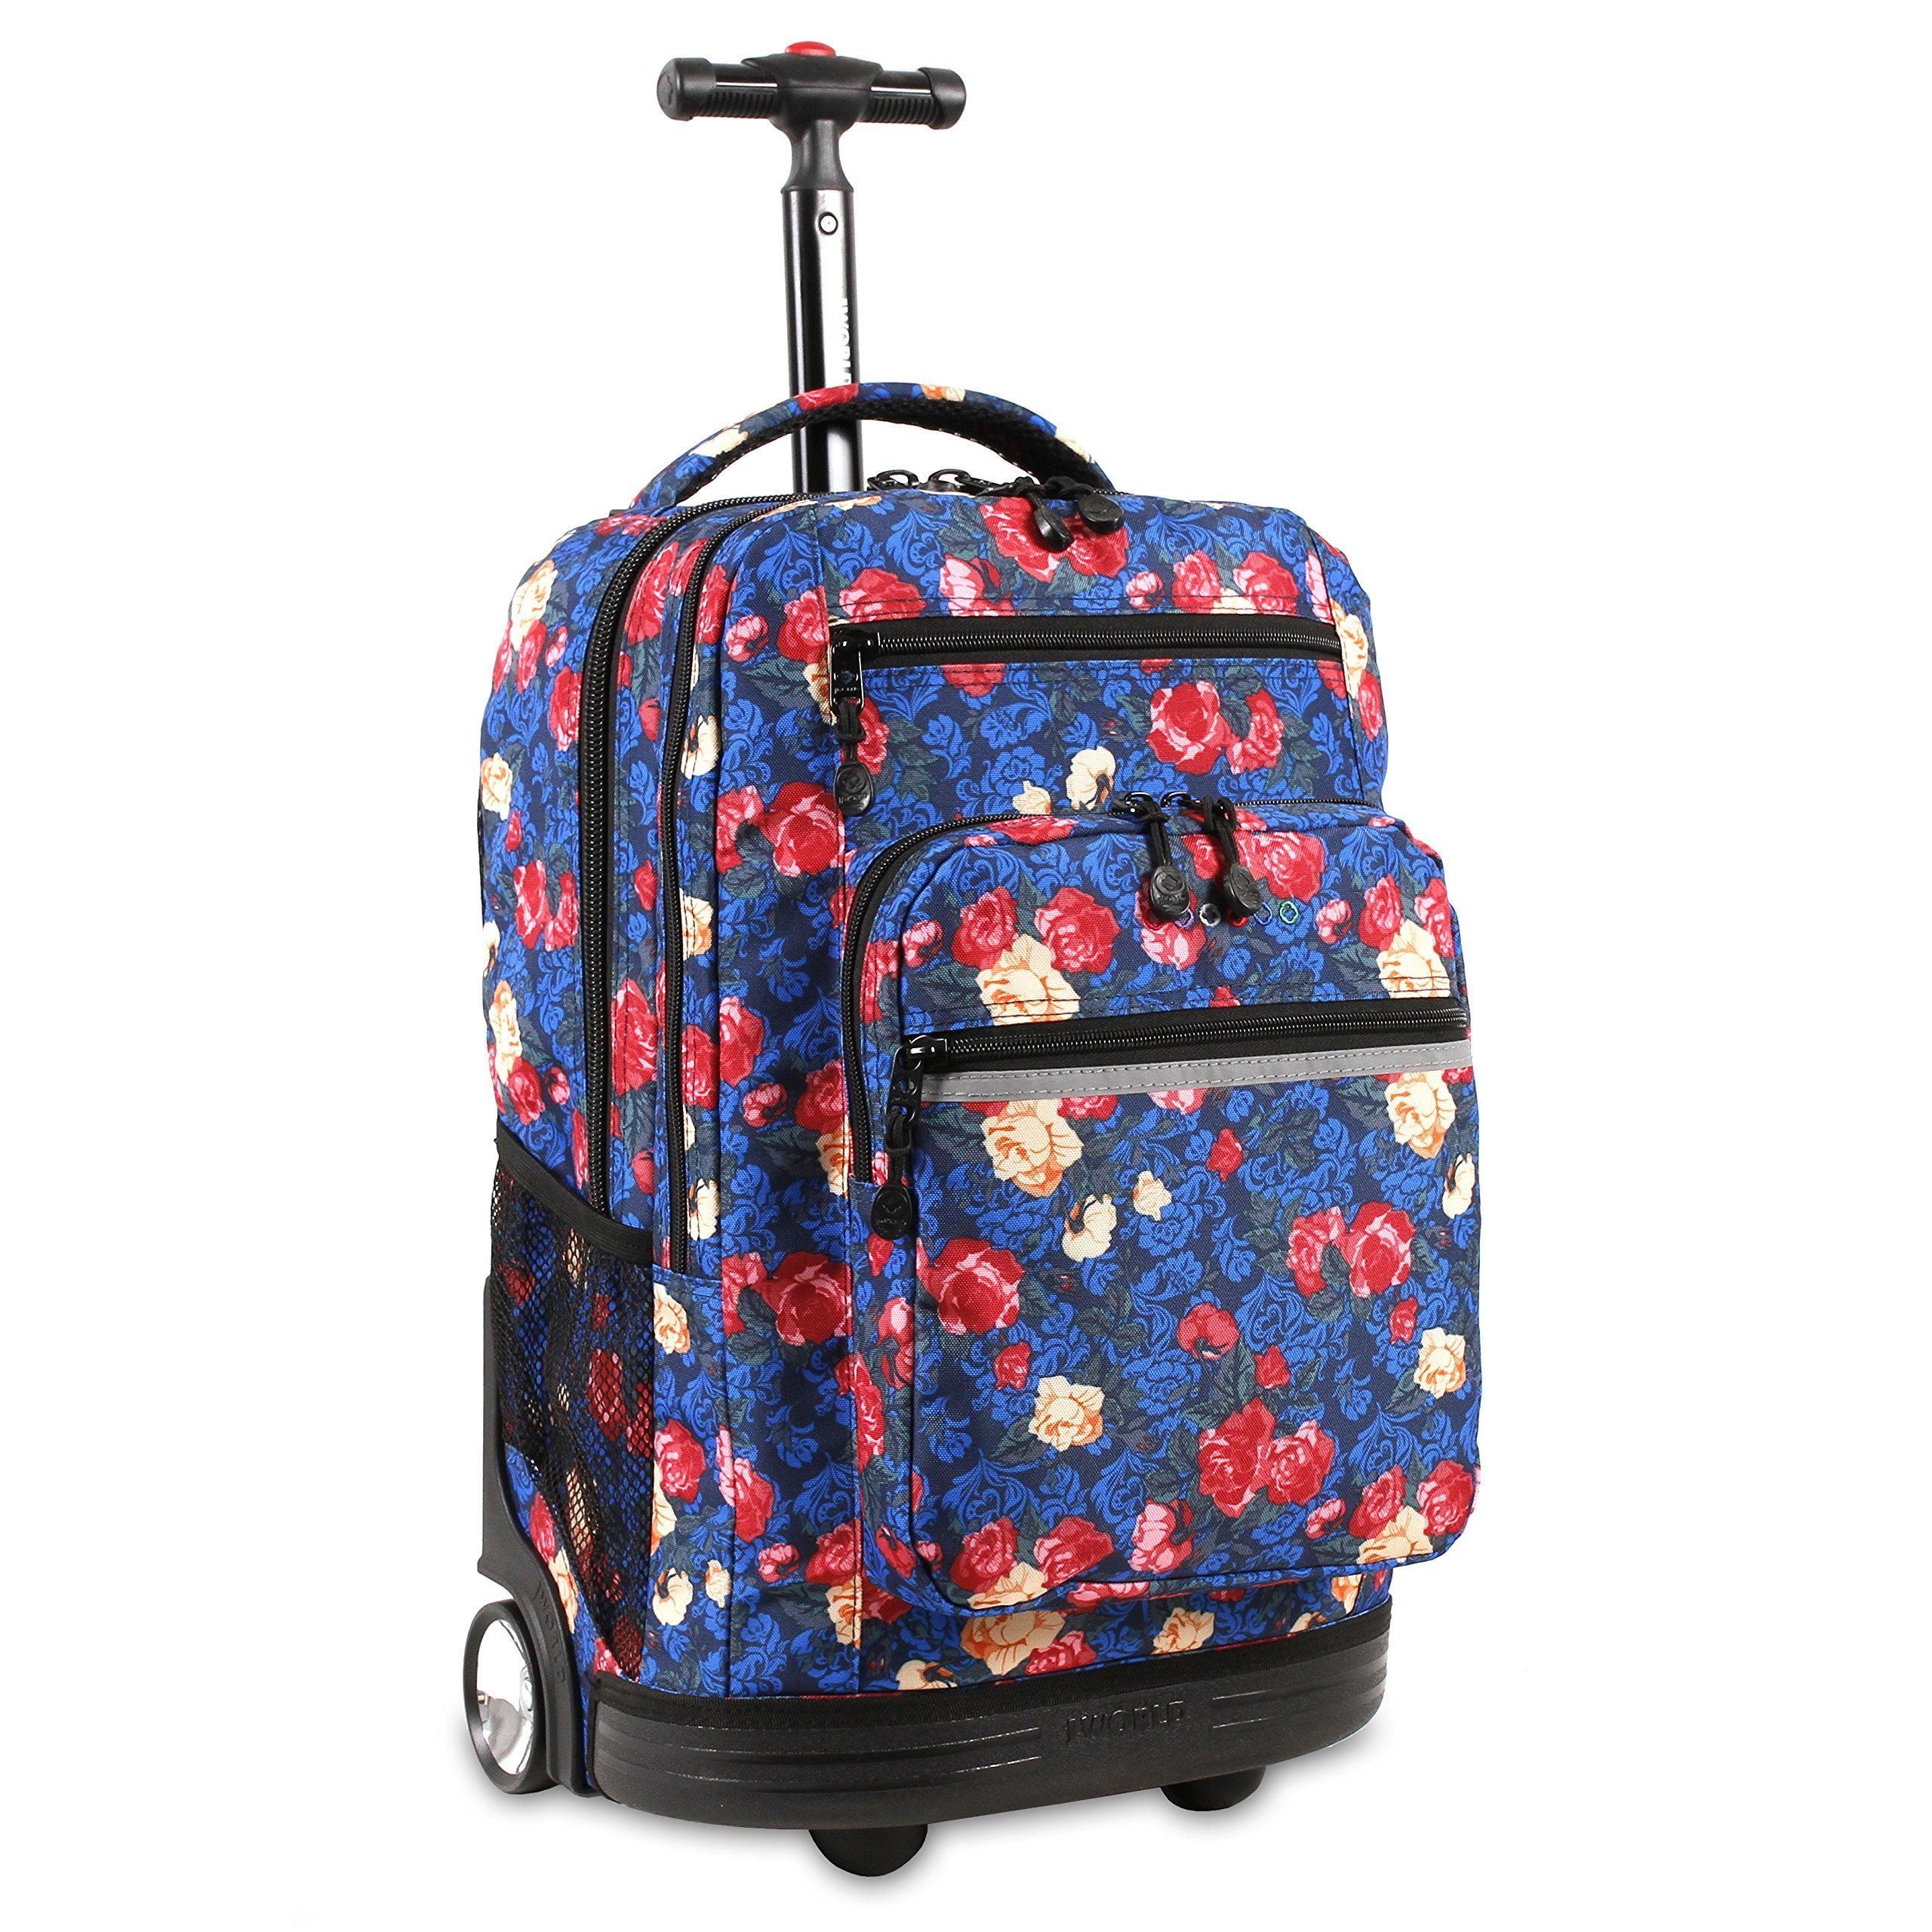 J World New York Sundance Laptop Rolling Backpack, Vintage Rose by J World New York